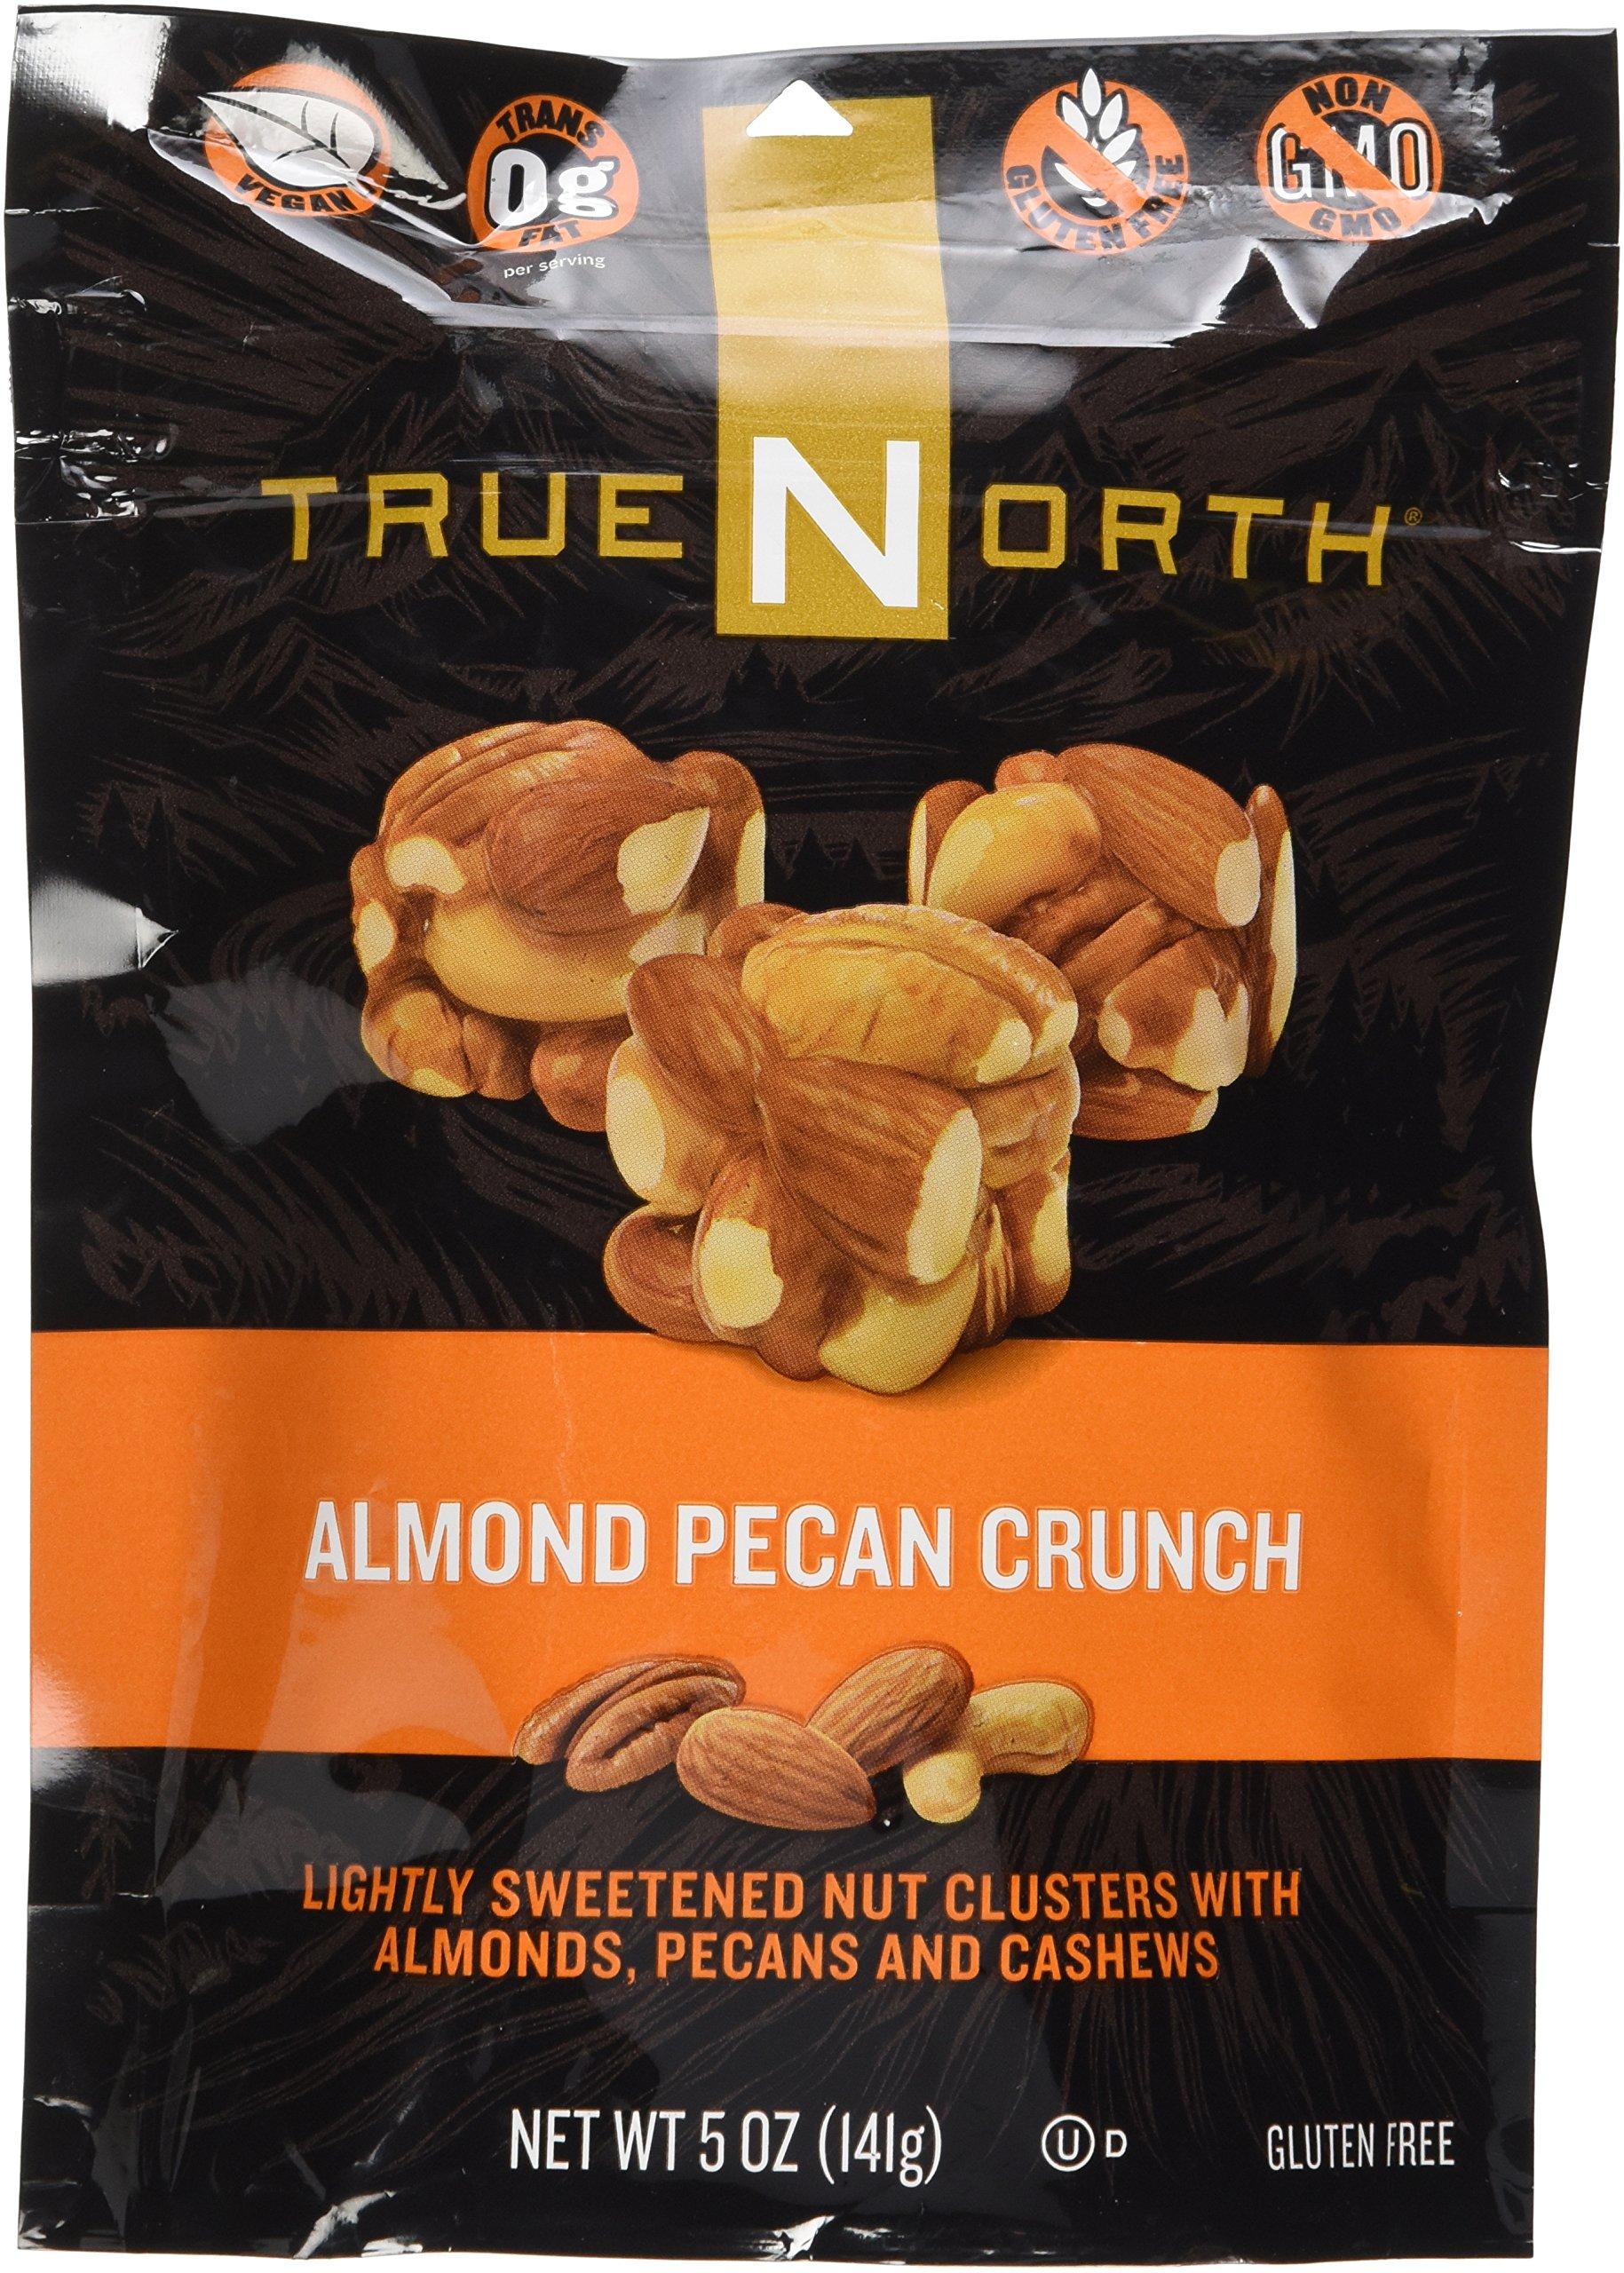 True North Almond Pecan Crunch Nut Clusters 5oz Bag